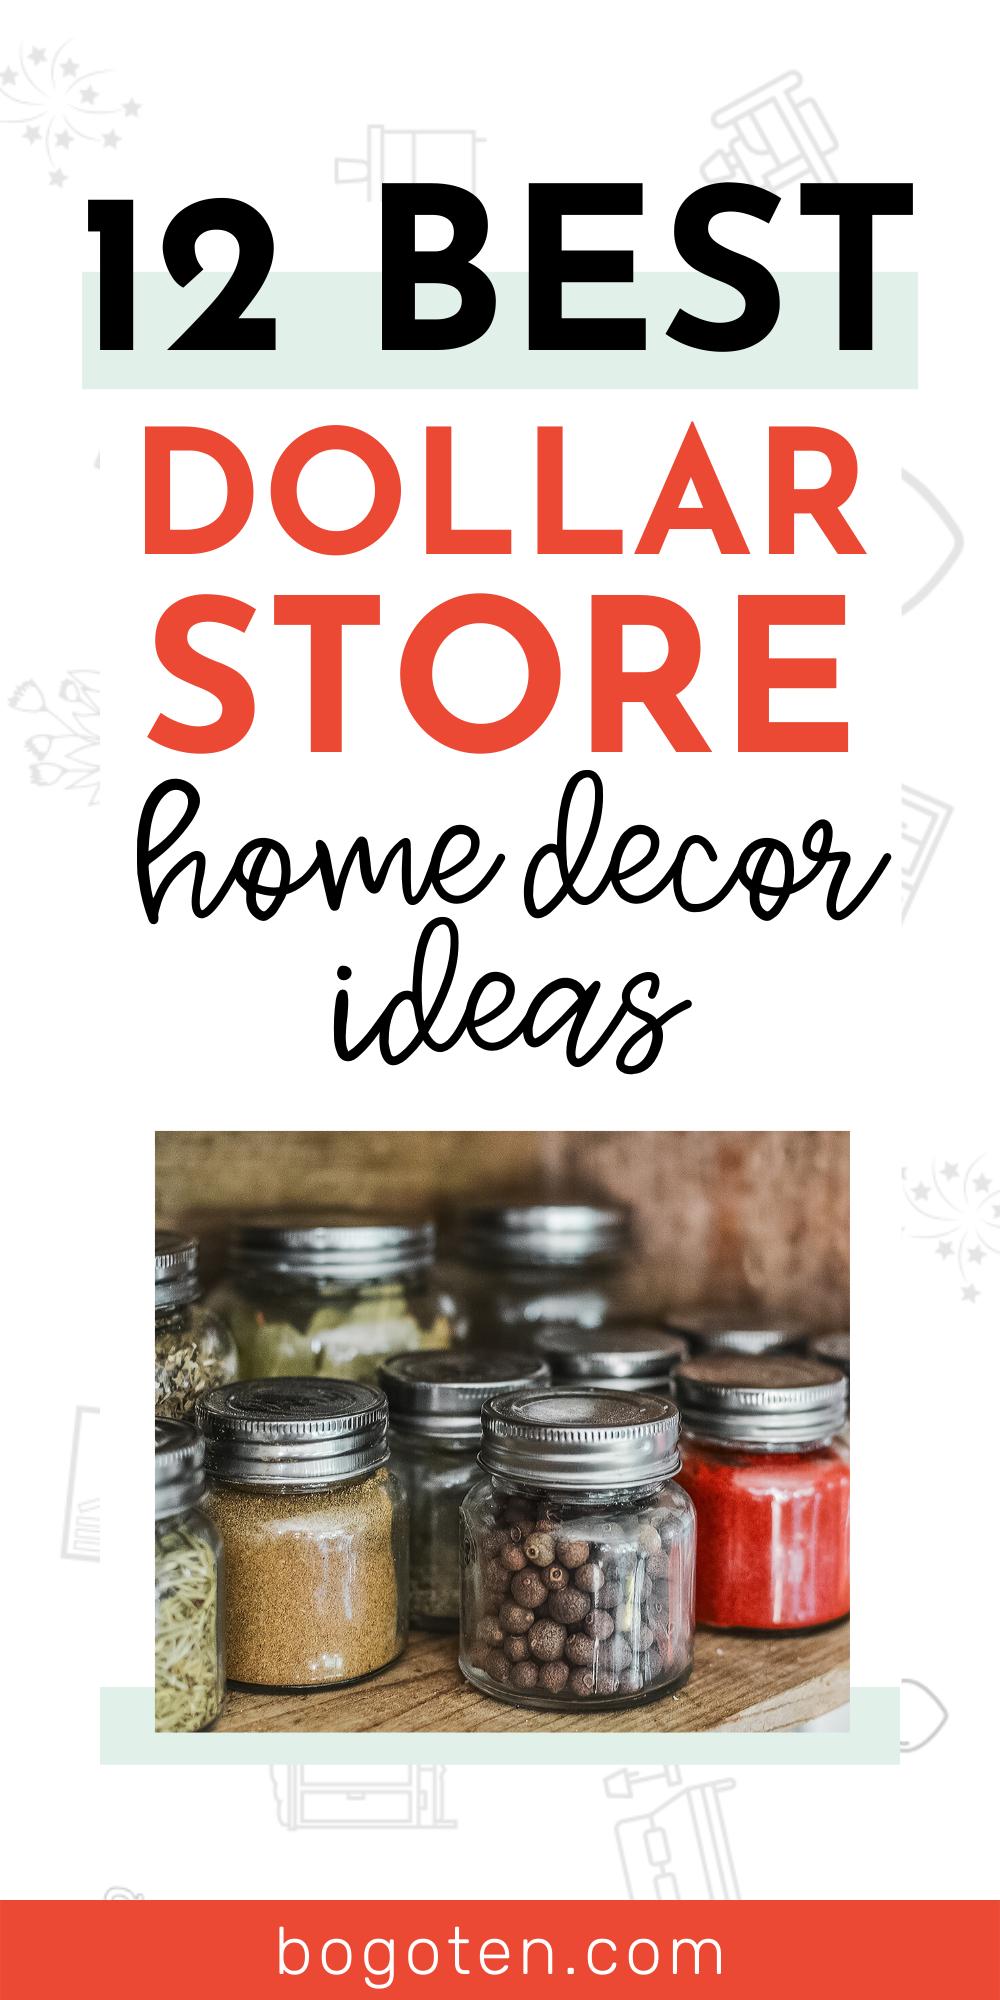 13 Beautiful Home Decor Ideas Using Cheap Dollar Store ...